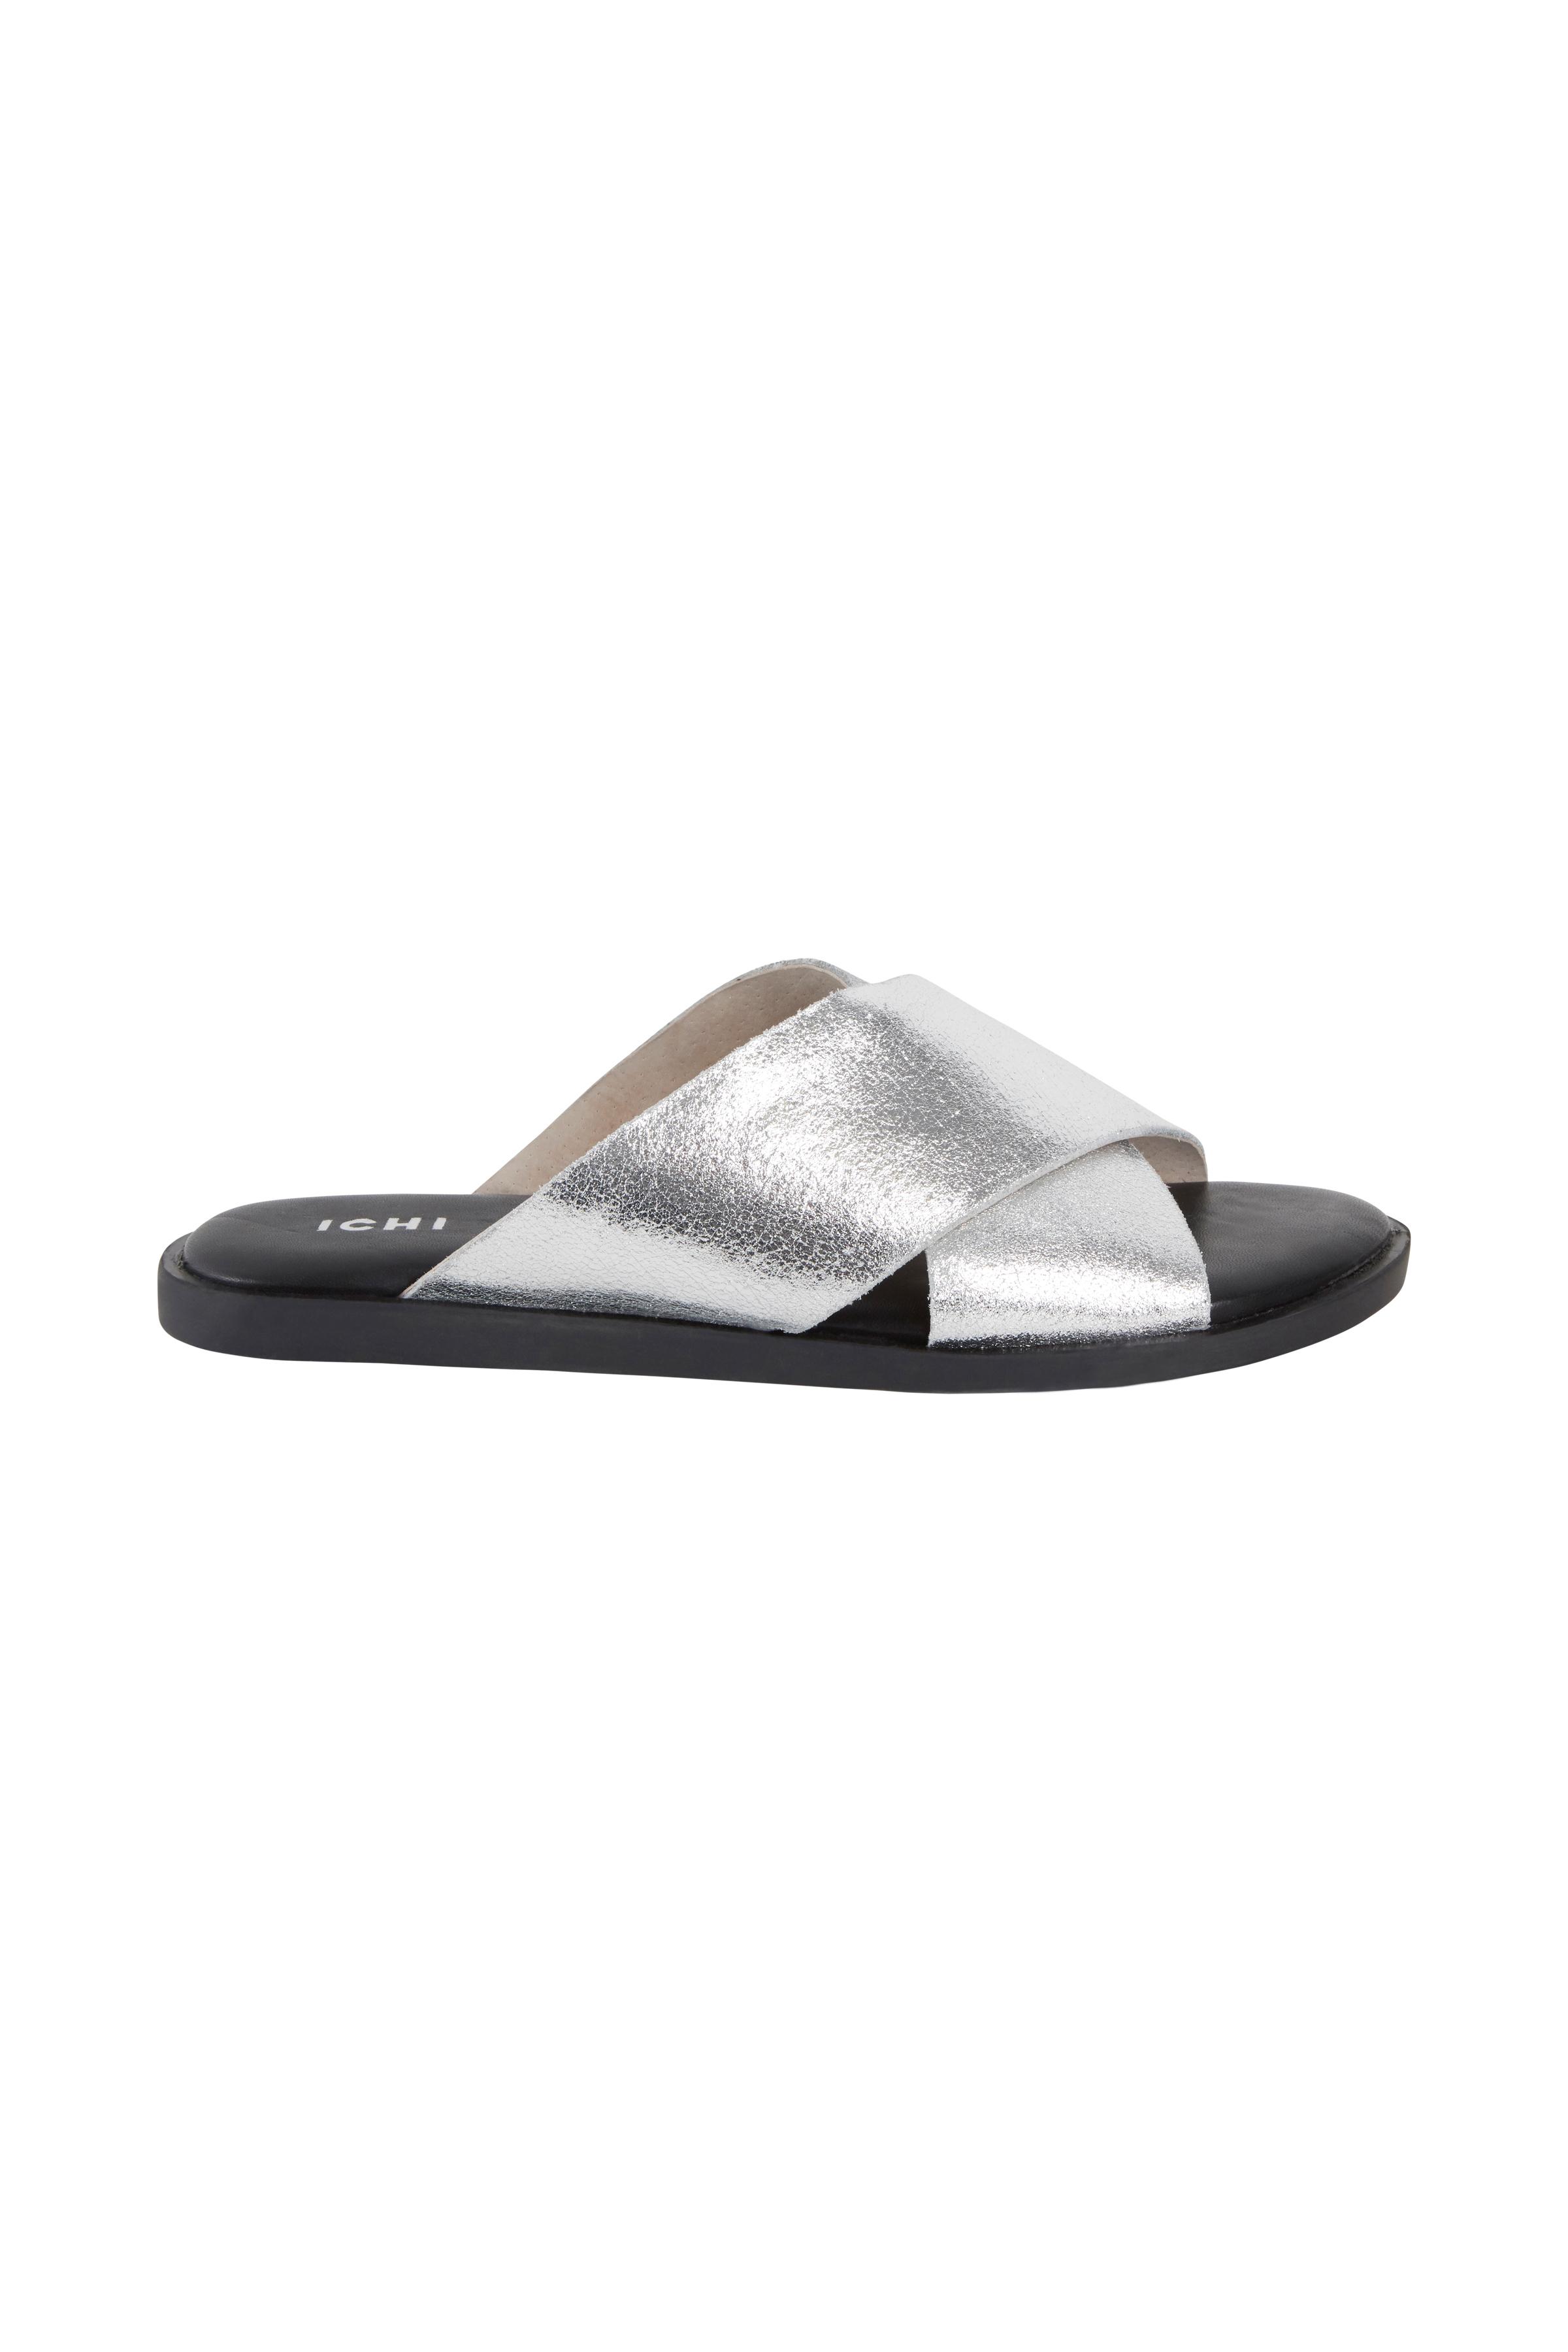 Ichi - accessories Dame Sandal - Sølv